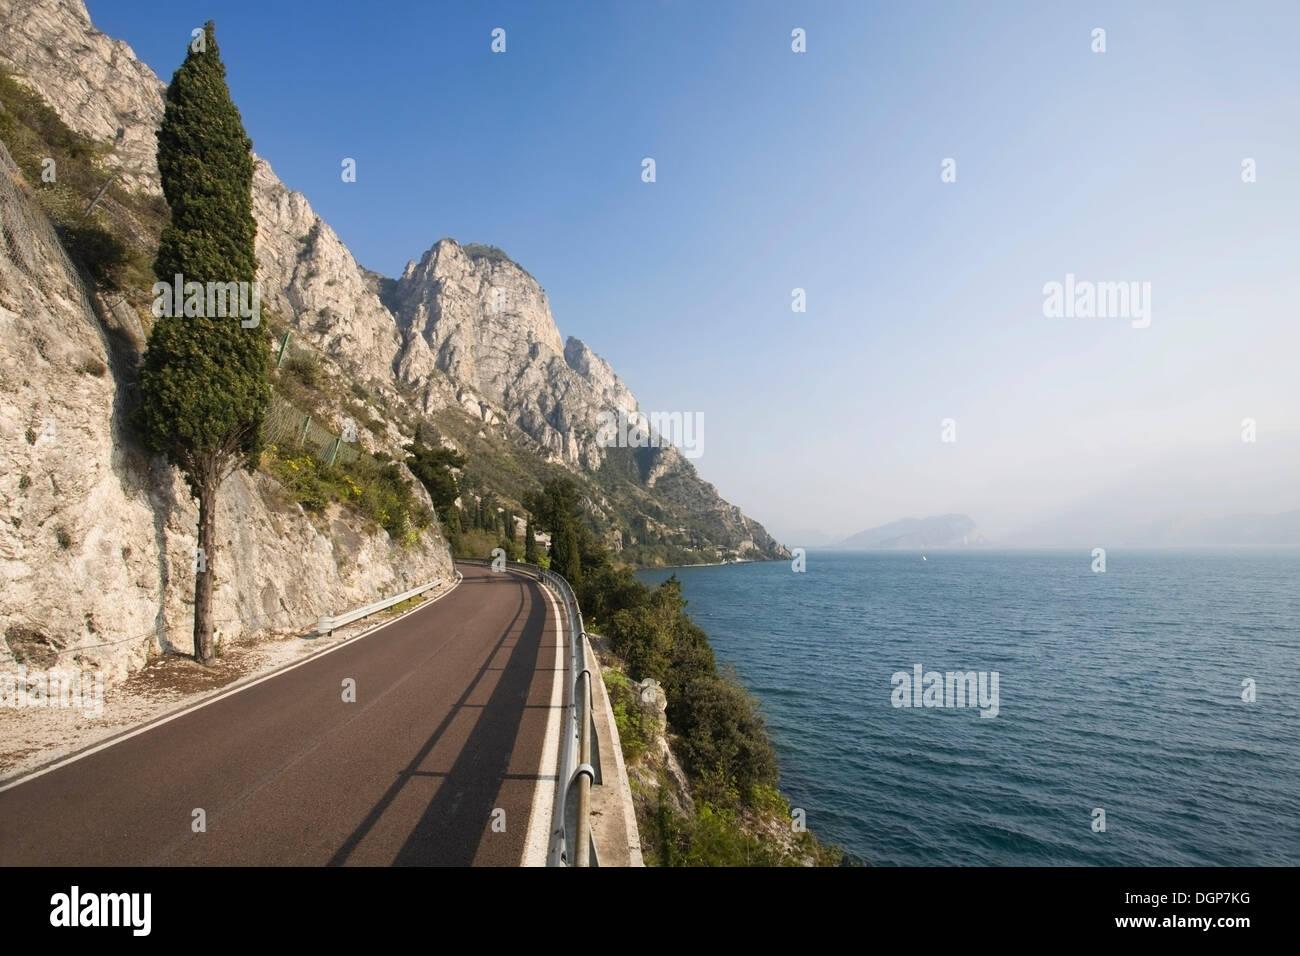 Gardesana Occidentale road on the western bluff of Lake Garda, Lombardy, Italy, Europe - Stock Image